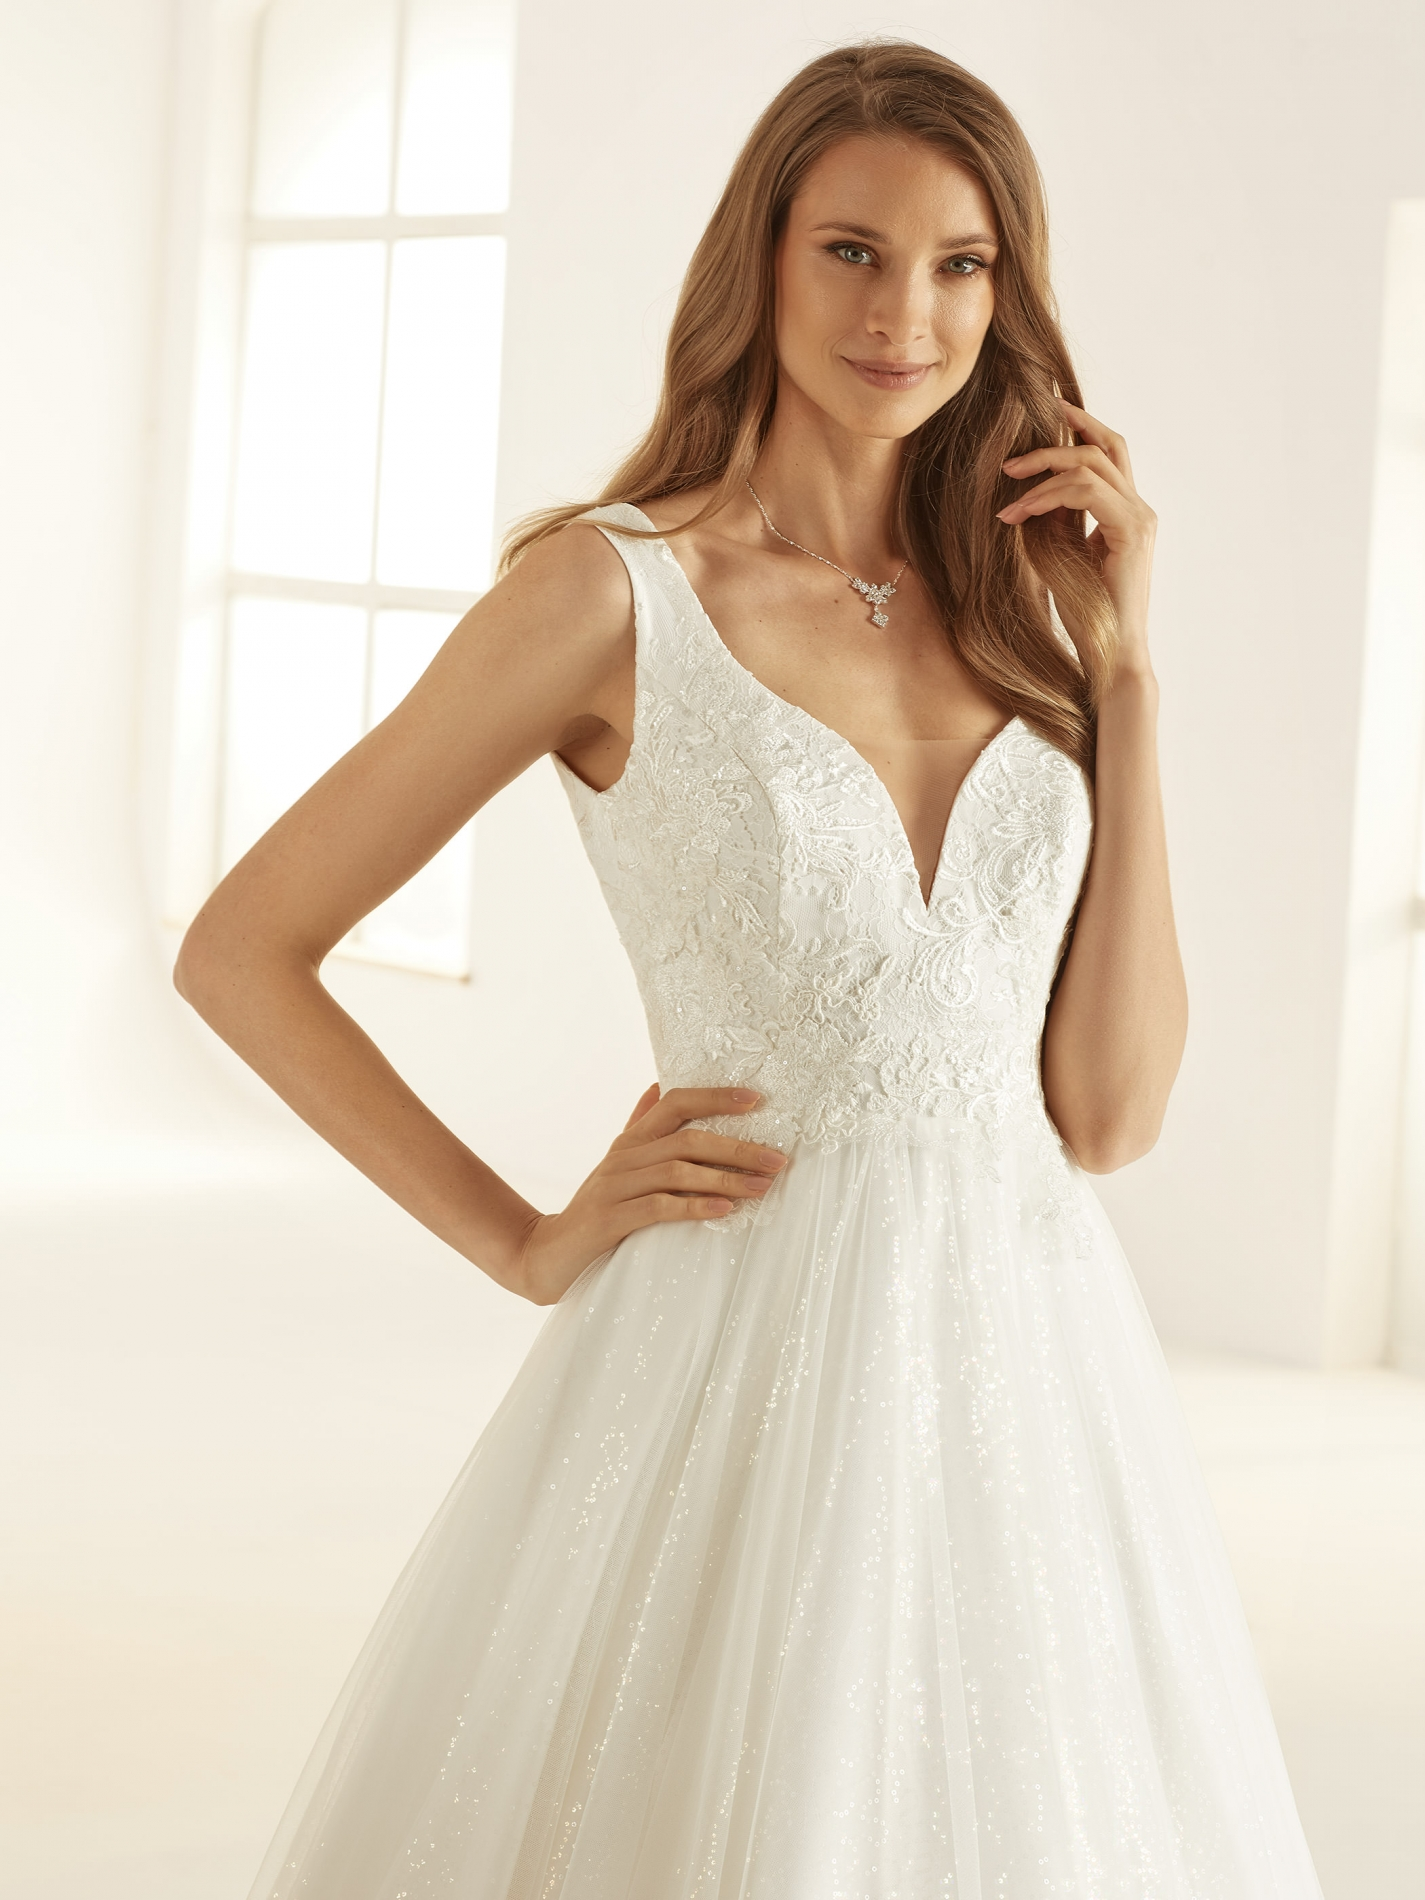 LARISSA-Bianco-Evento-bridal-dress-(2)